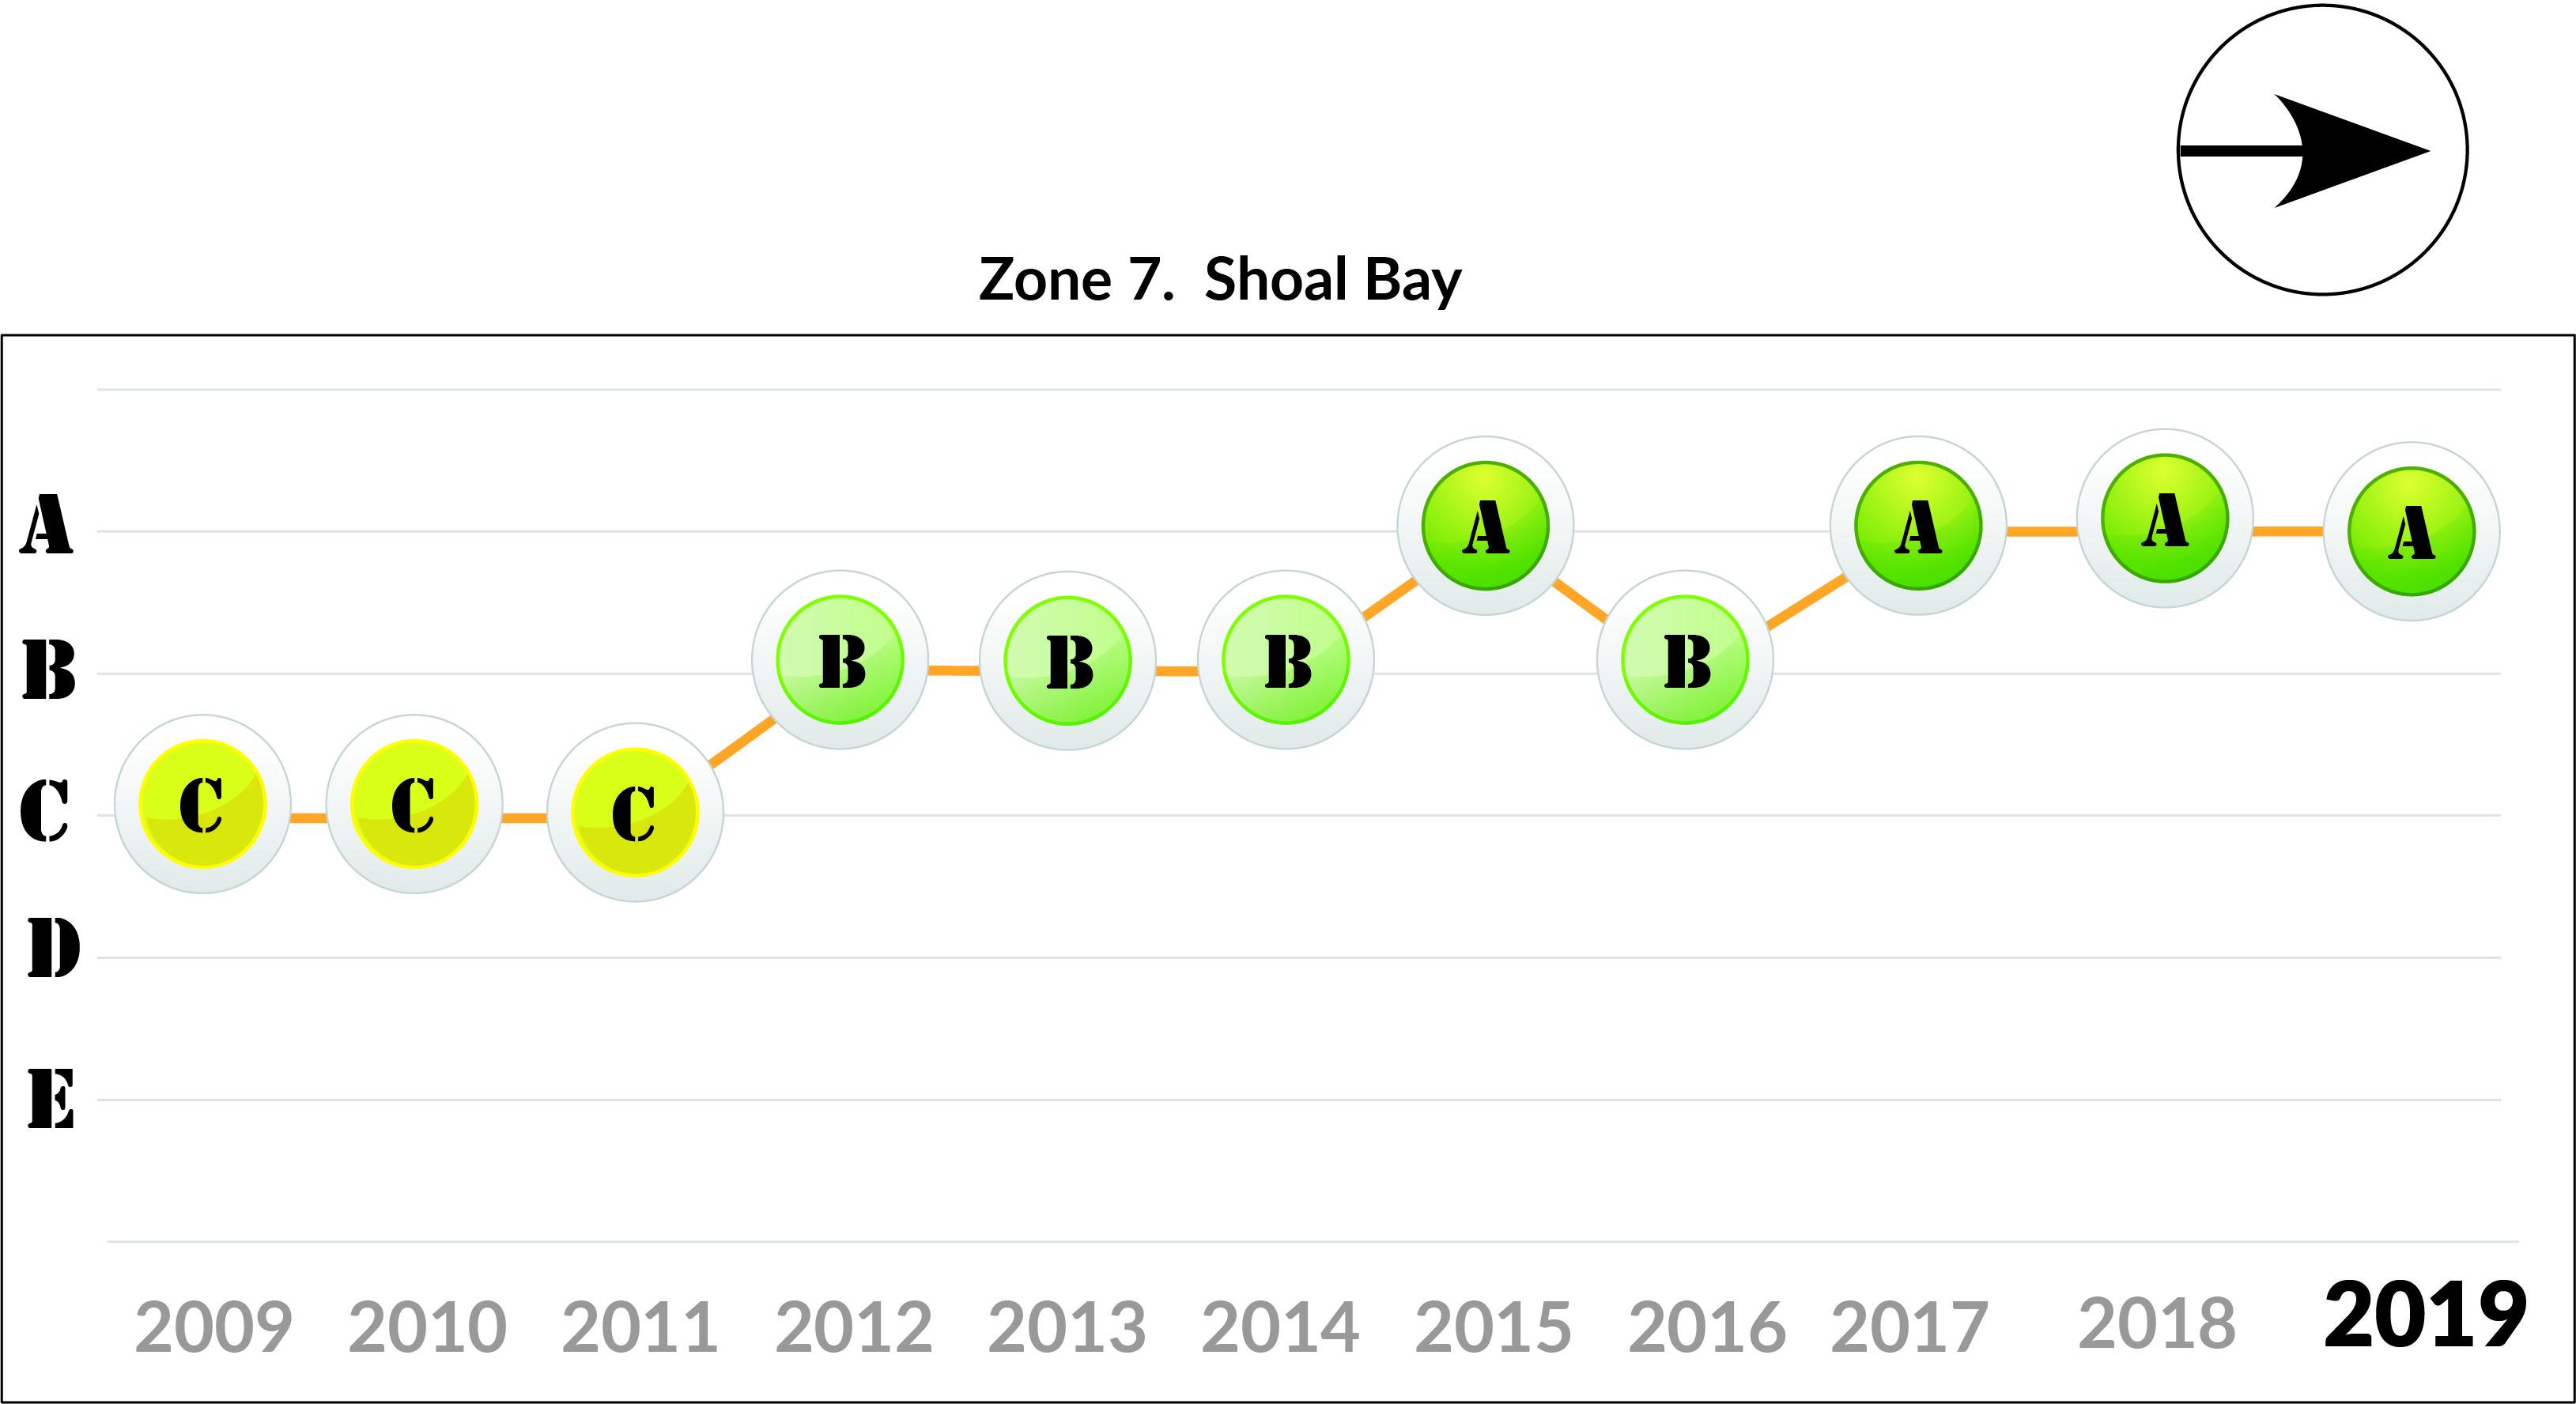 Zone 7 Shoal Bay trends